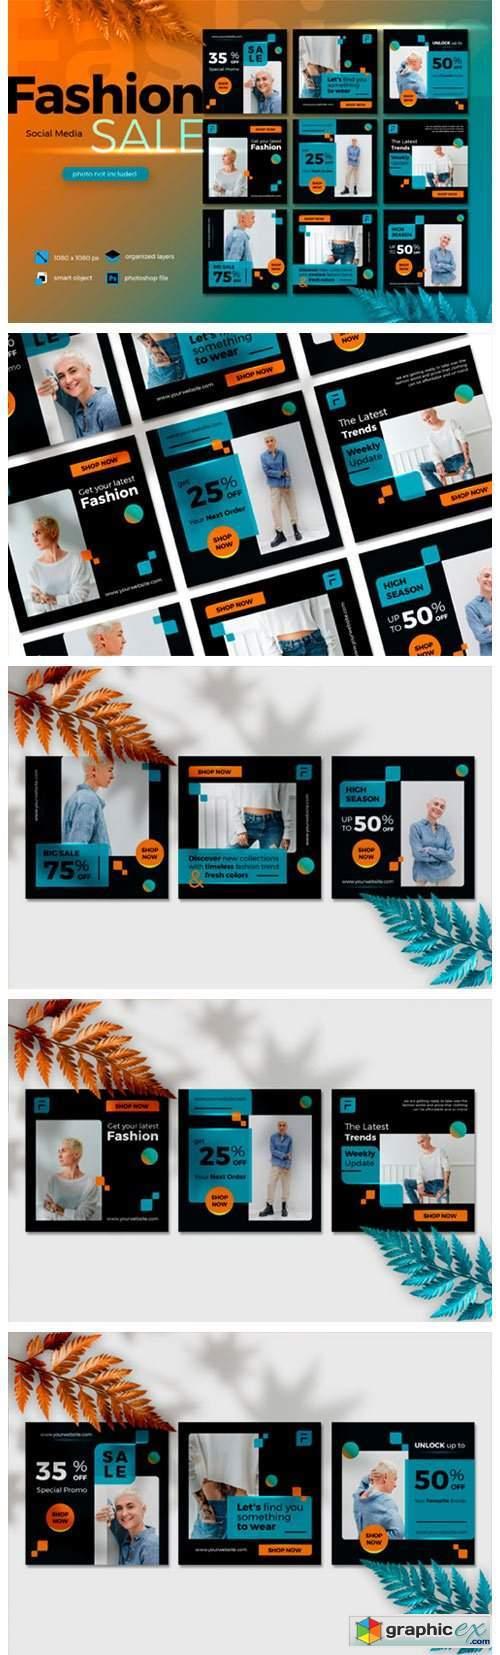 Fashion Sale Social Media Lava Lush 2